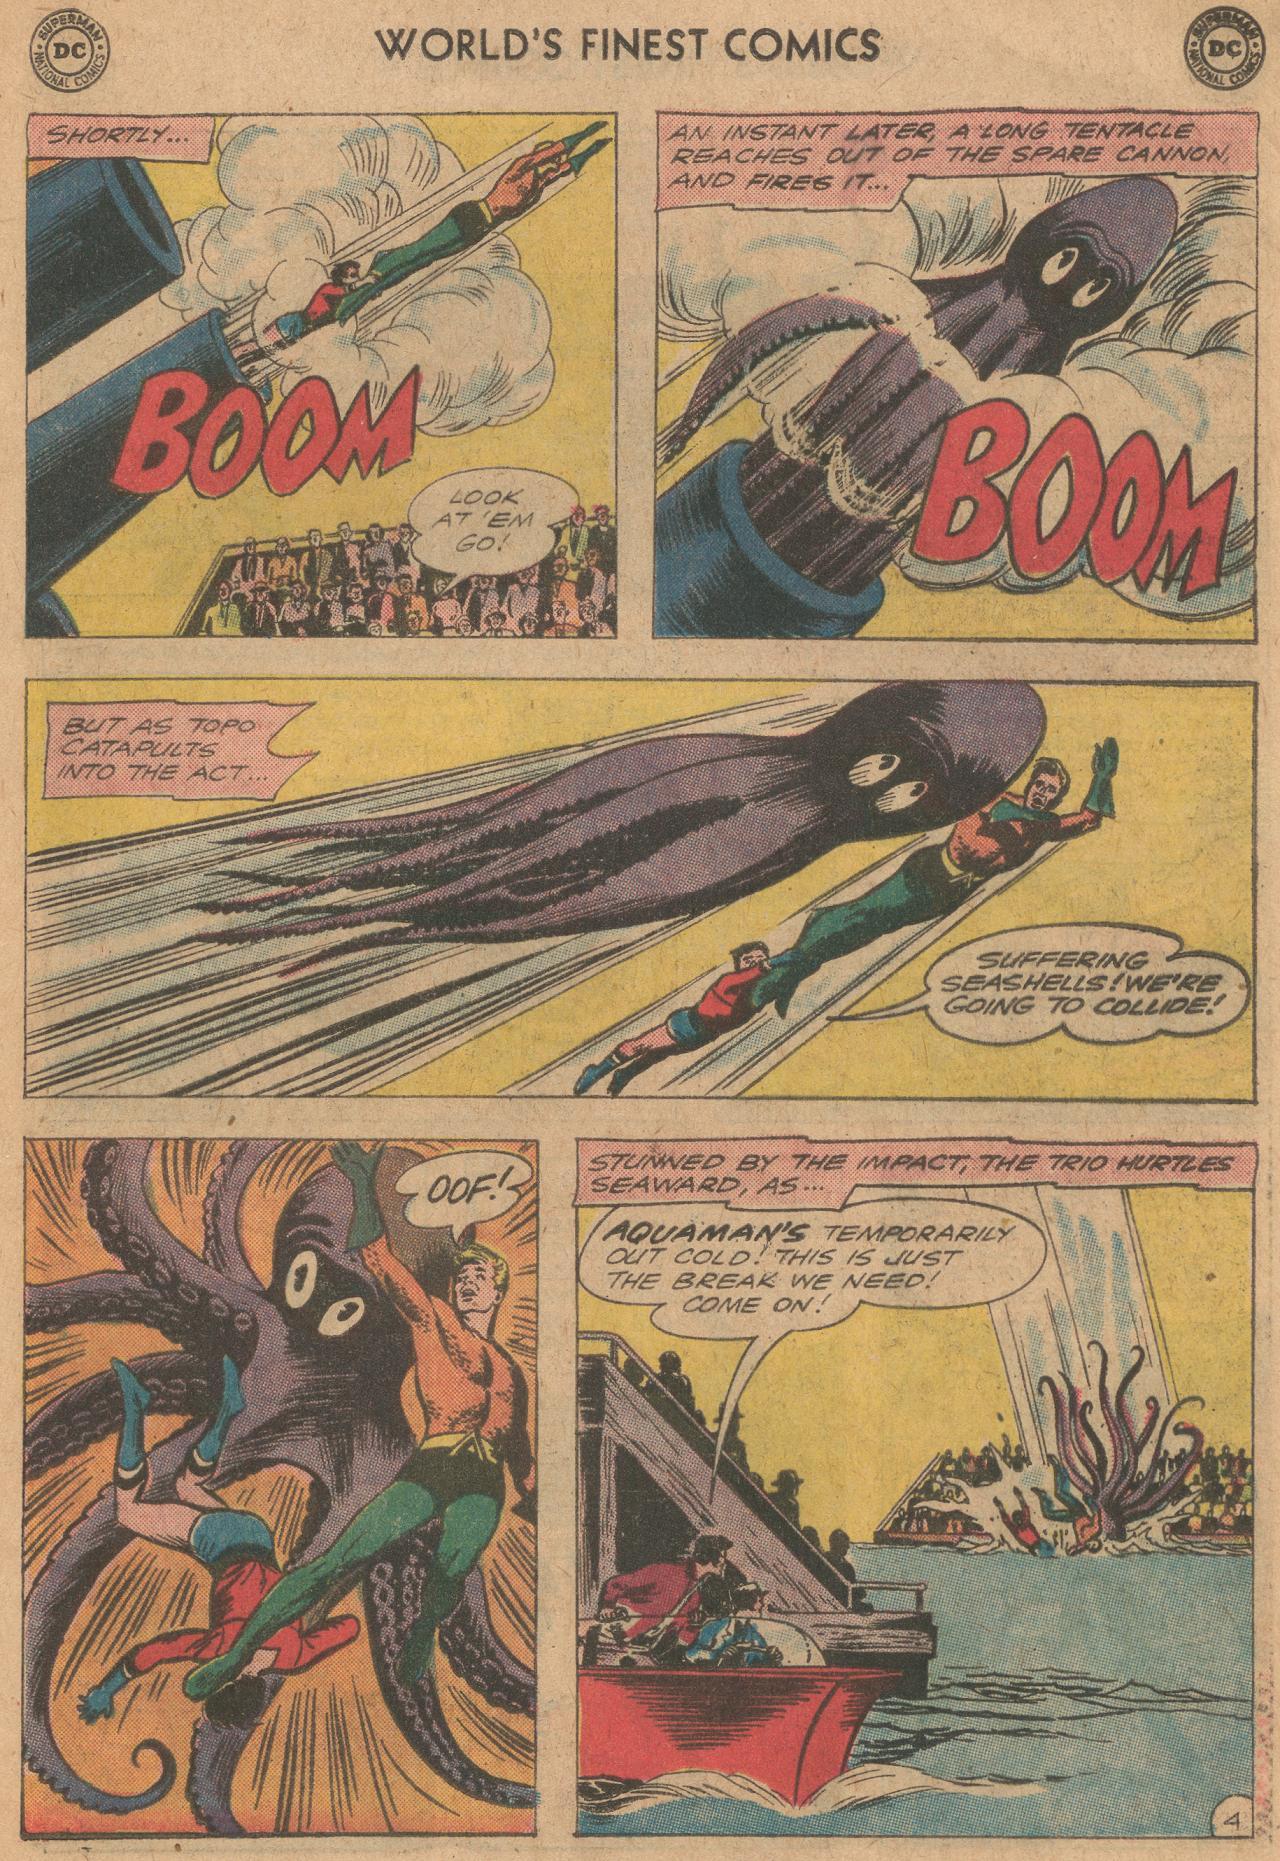 Read online World's Finest Comics comic -  Issue #126 - 19